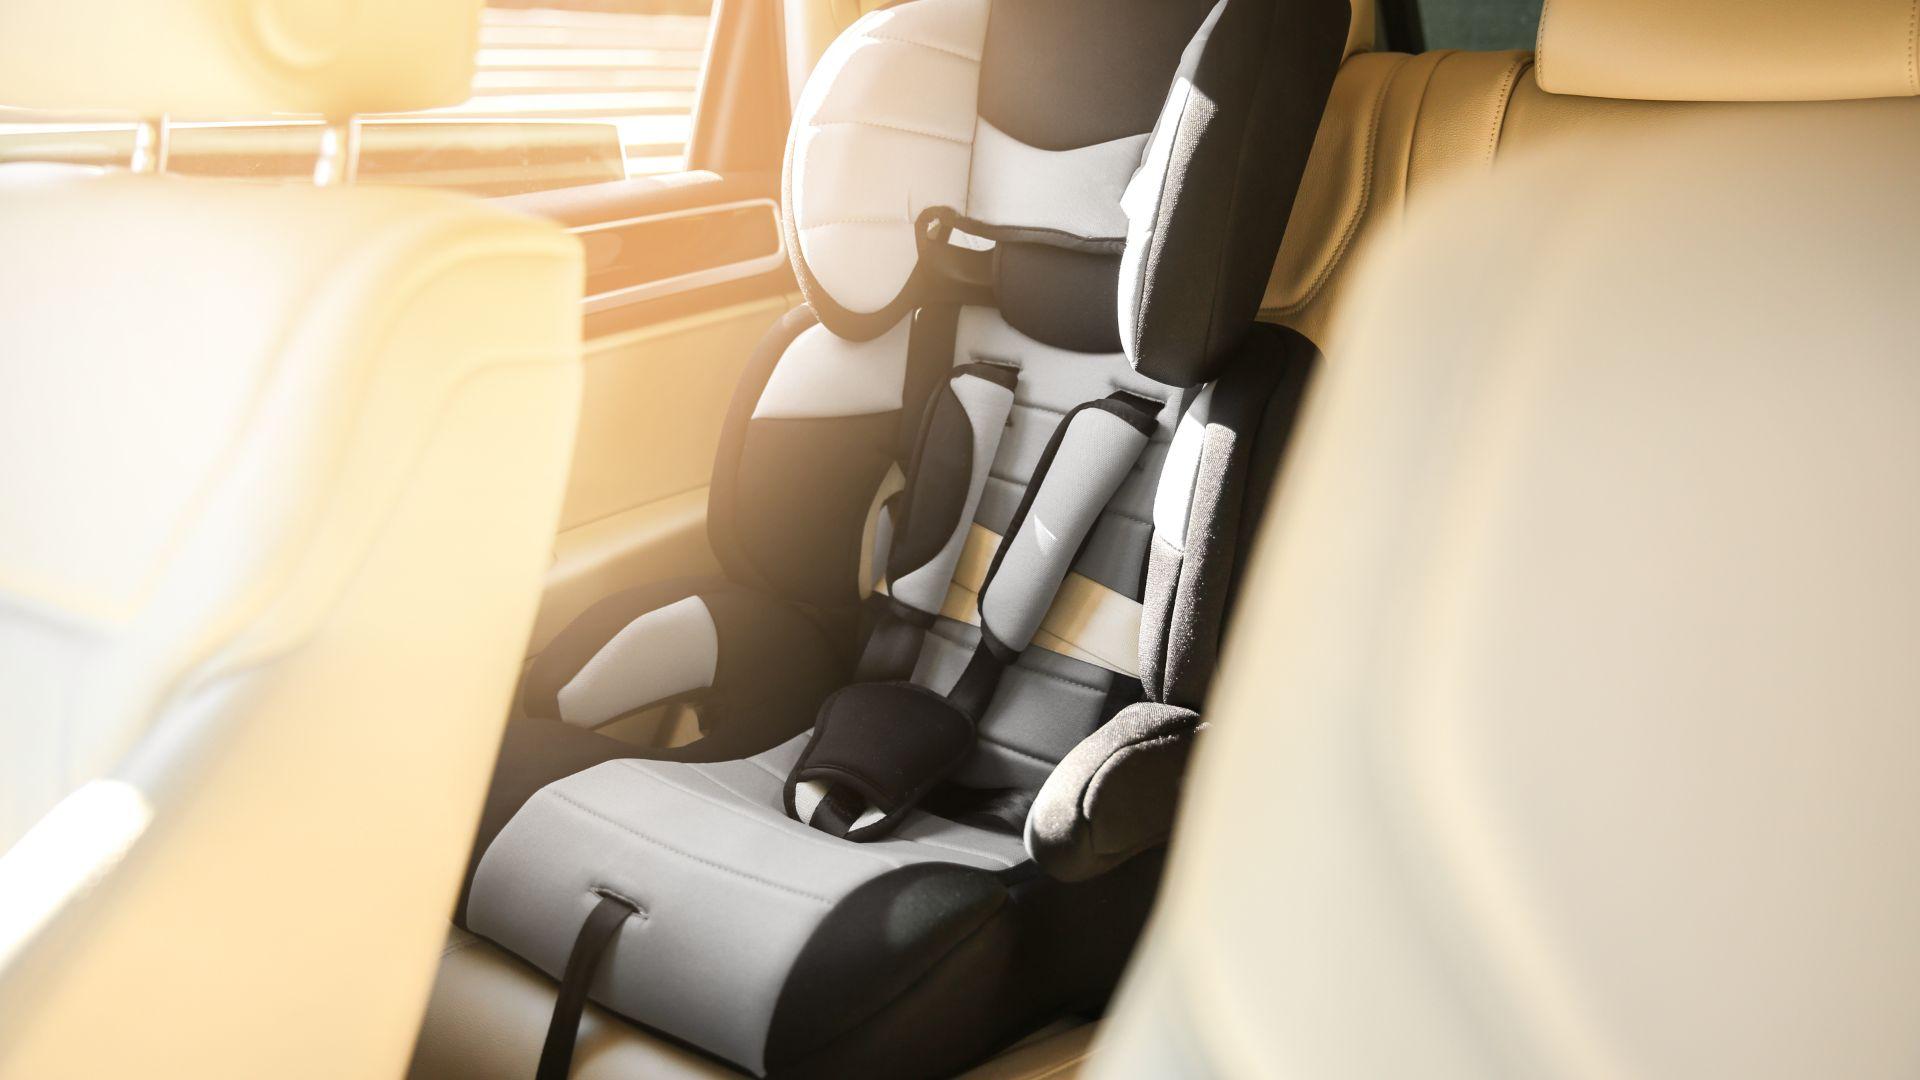 Dirty car child seat